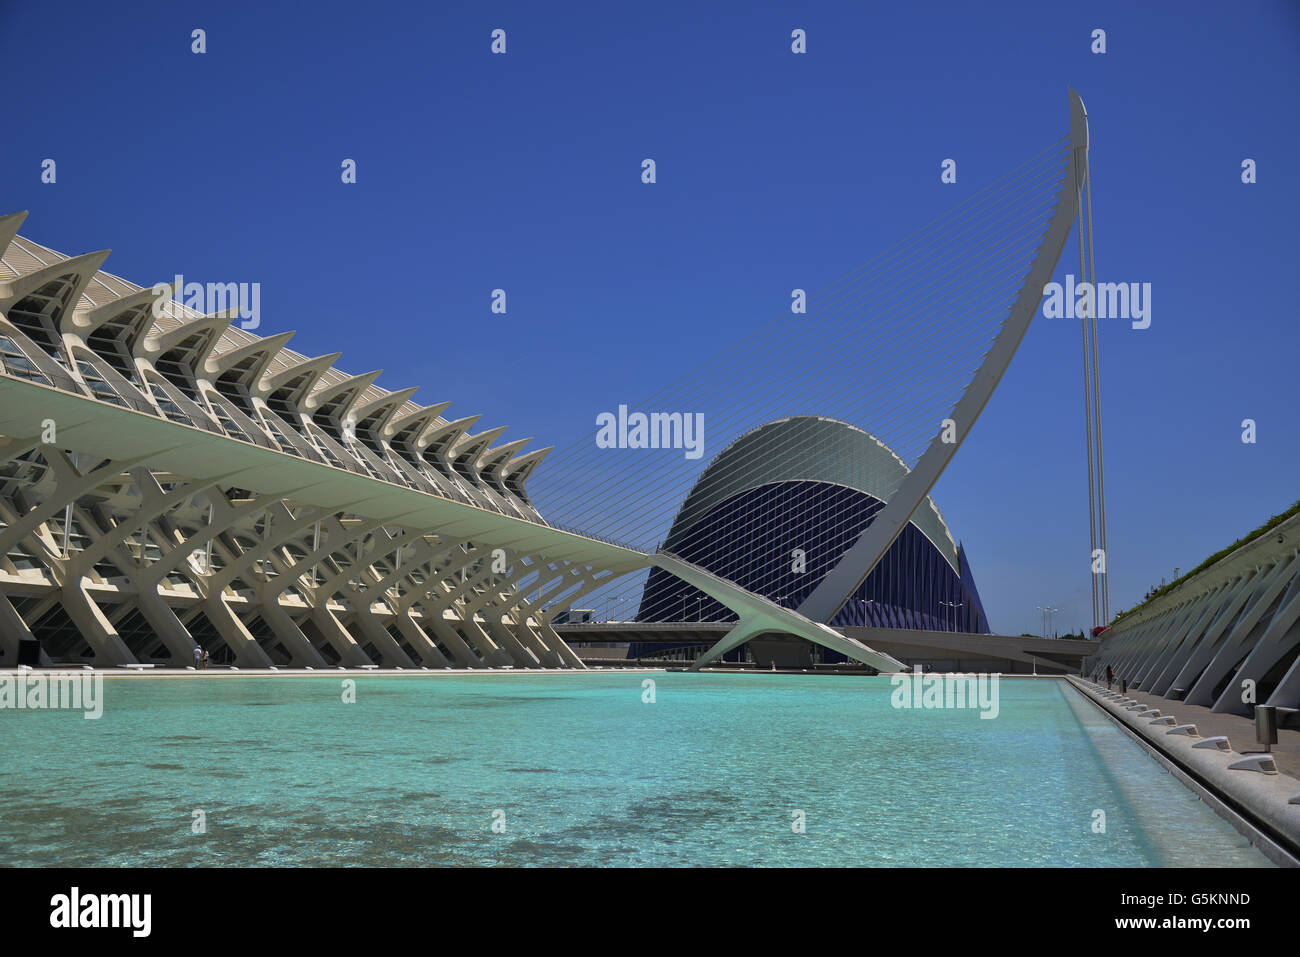 El Museu de les Ciencies Principe Felipe and L' Agora in the City of Arts and Sciences in Valencia by famous - Stock Image